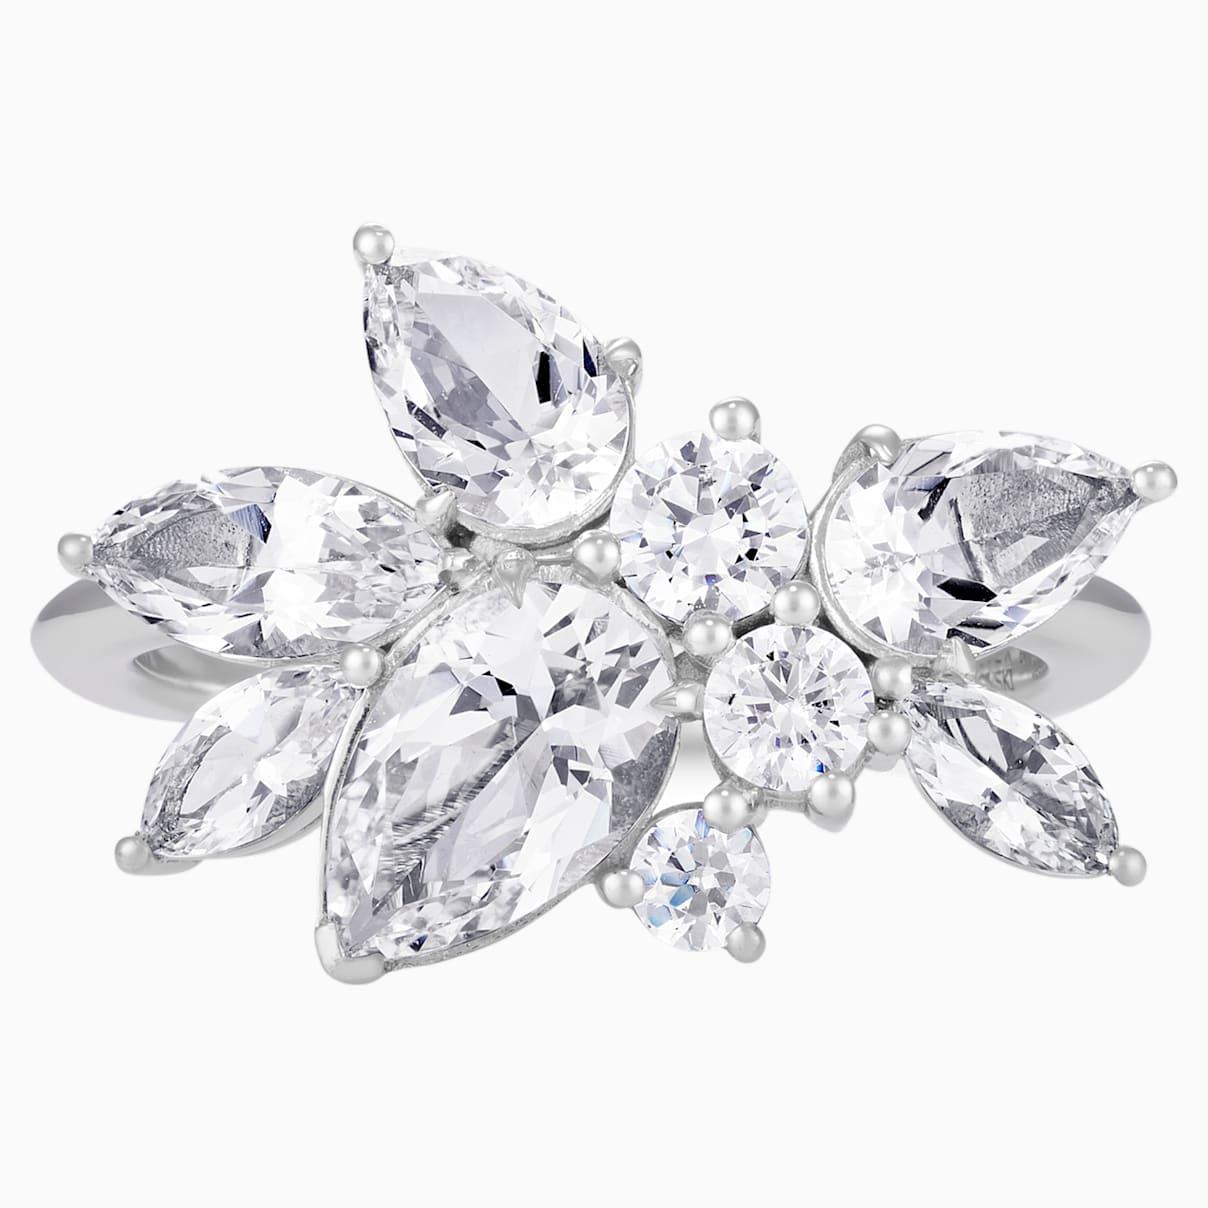 Luna Cluster Ring, Swarovski Created Diamonds, 18K White Gold, Size 55